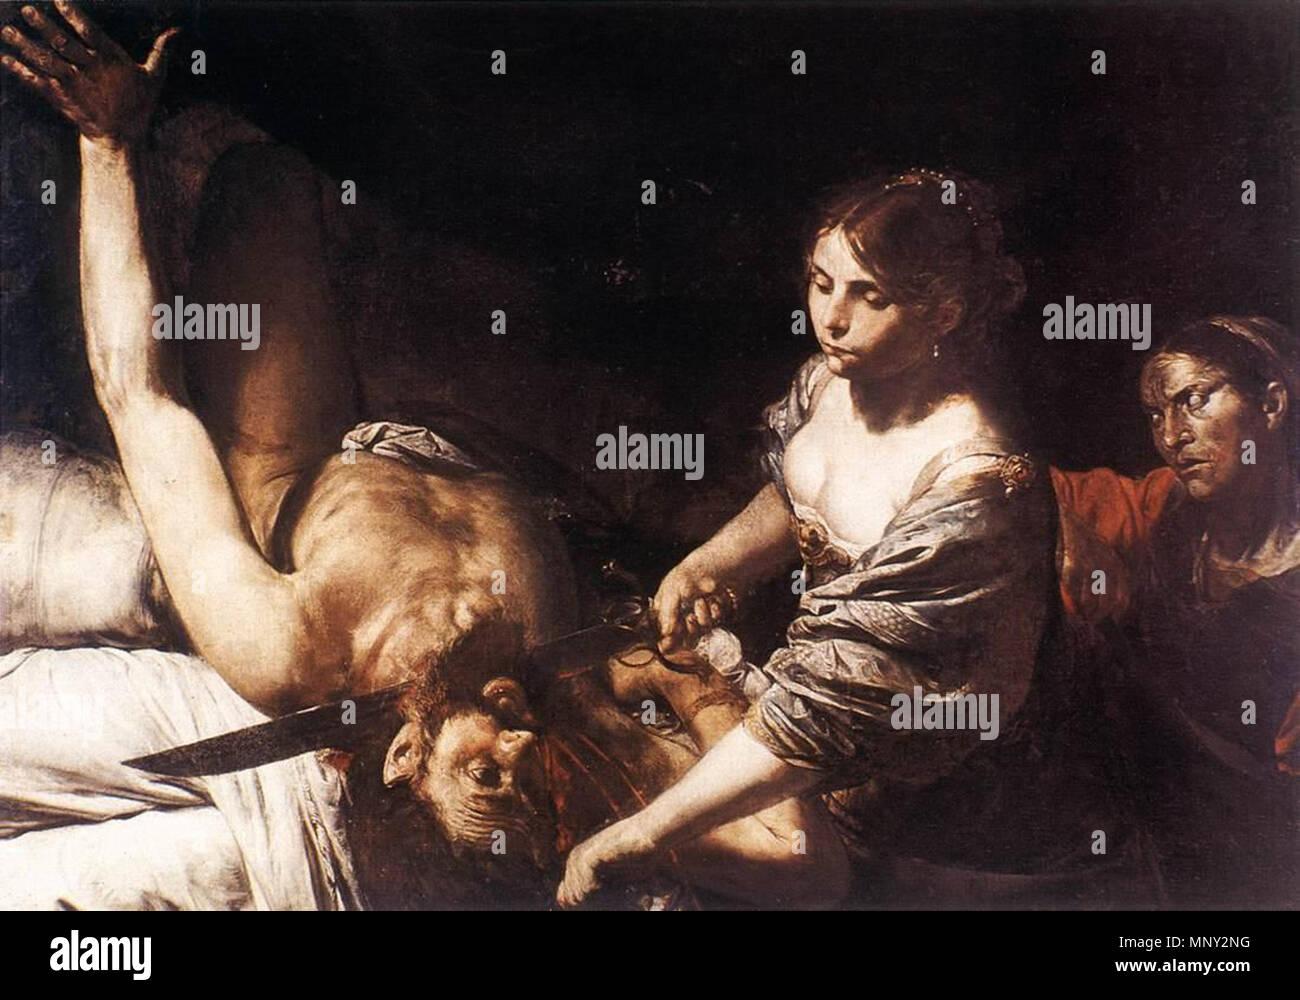 Judith  and Holofernes   circa 1626.   1218 Valentin de Boulogne - Judith and Holofernes - WGA24242 - Stock Image